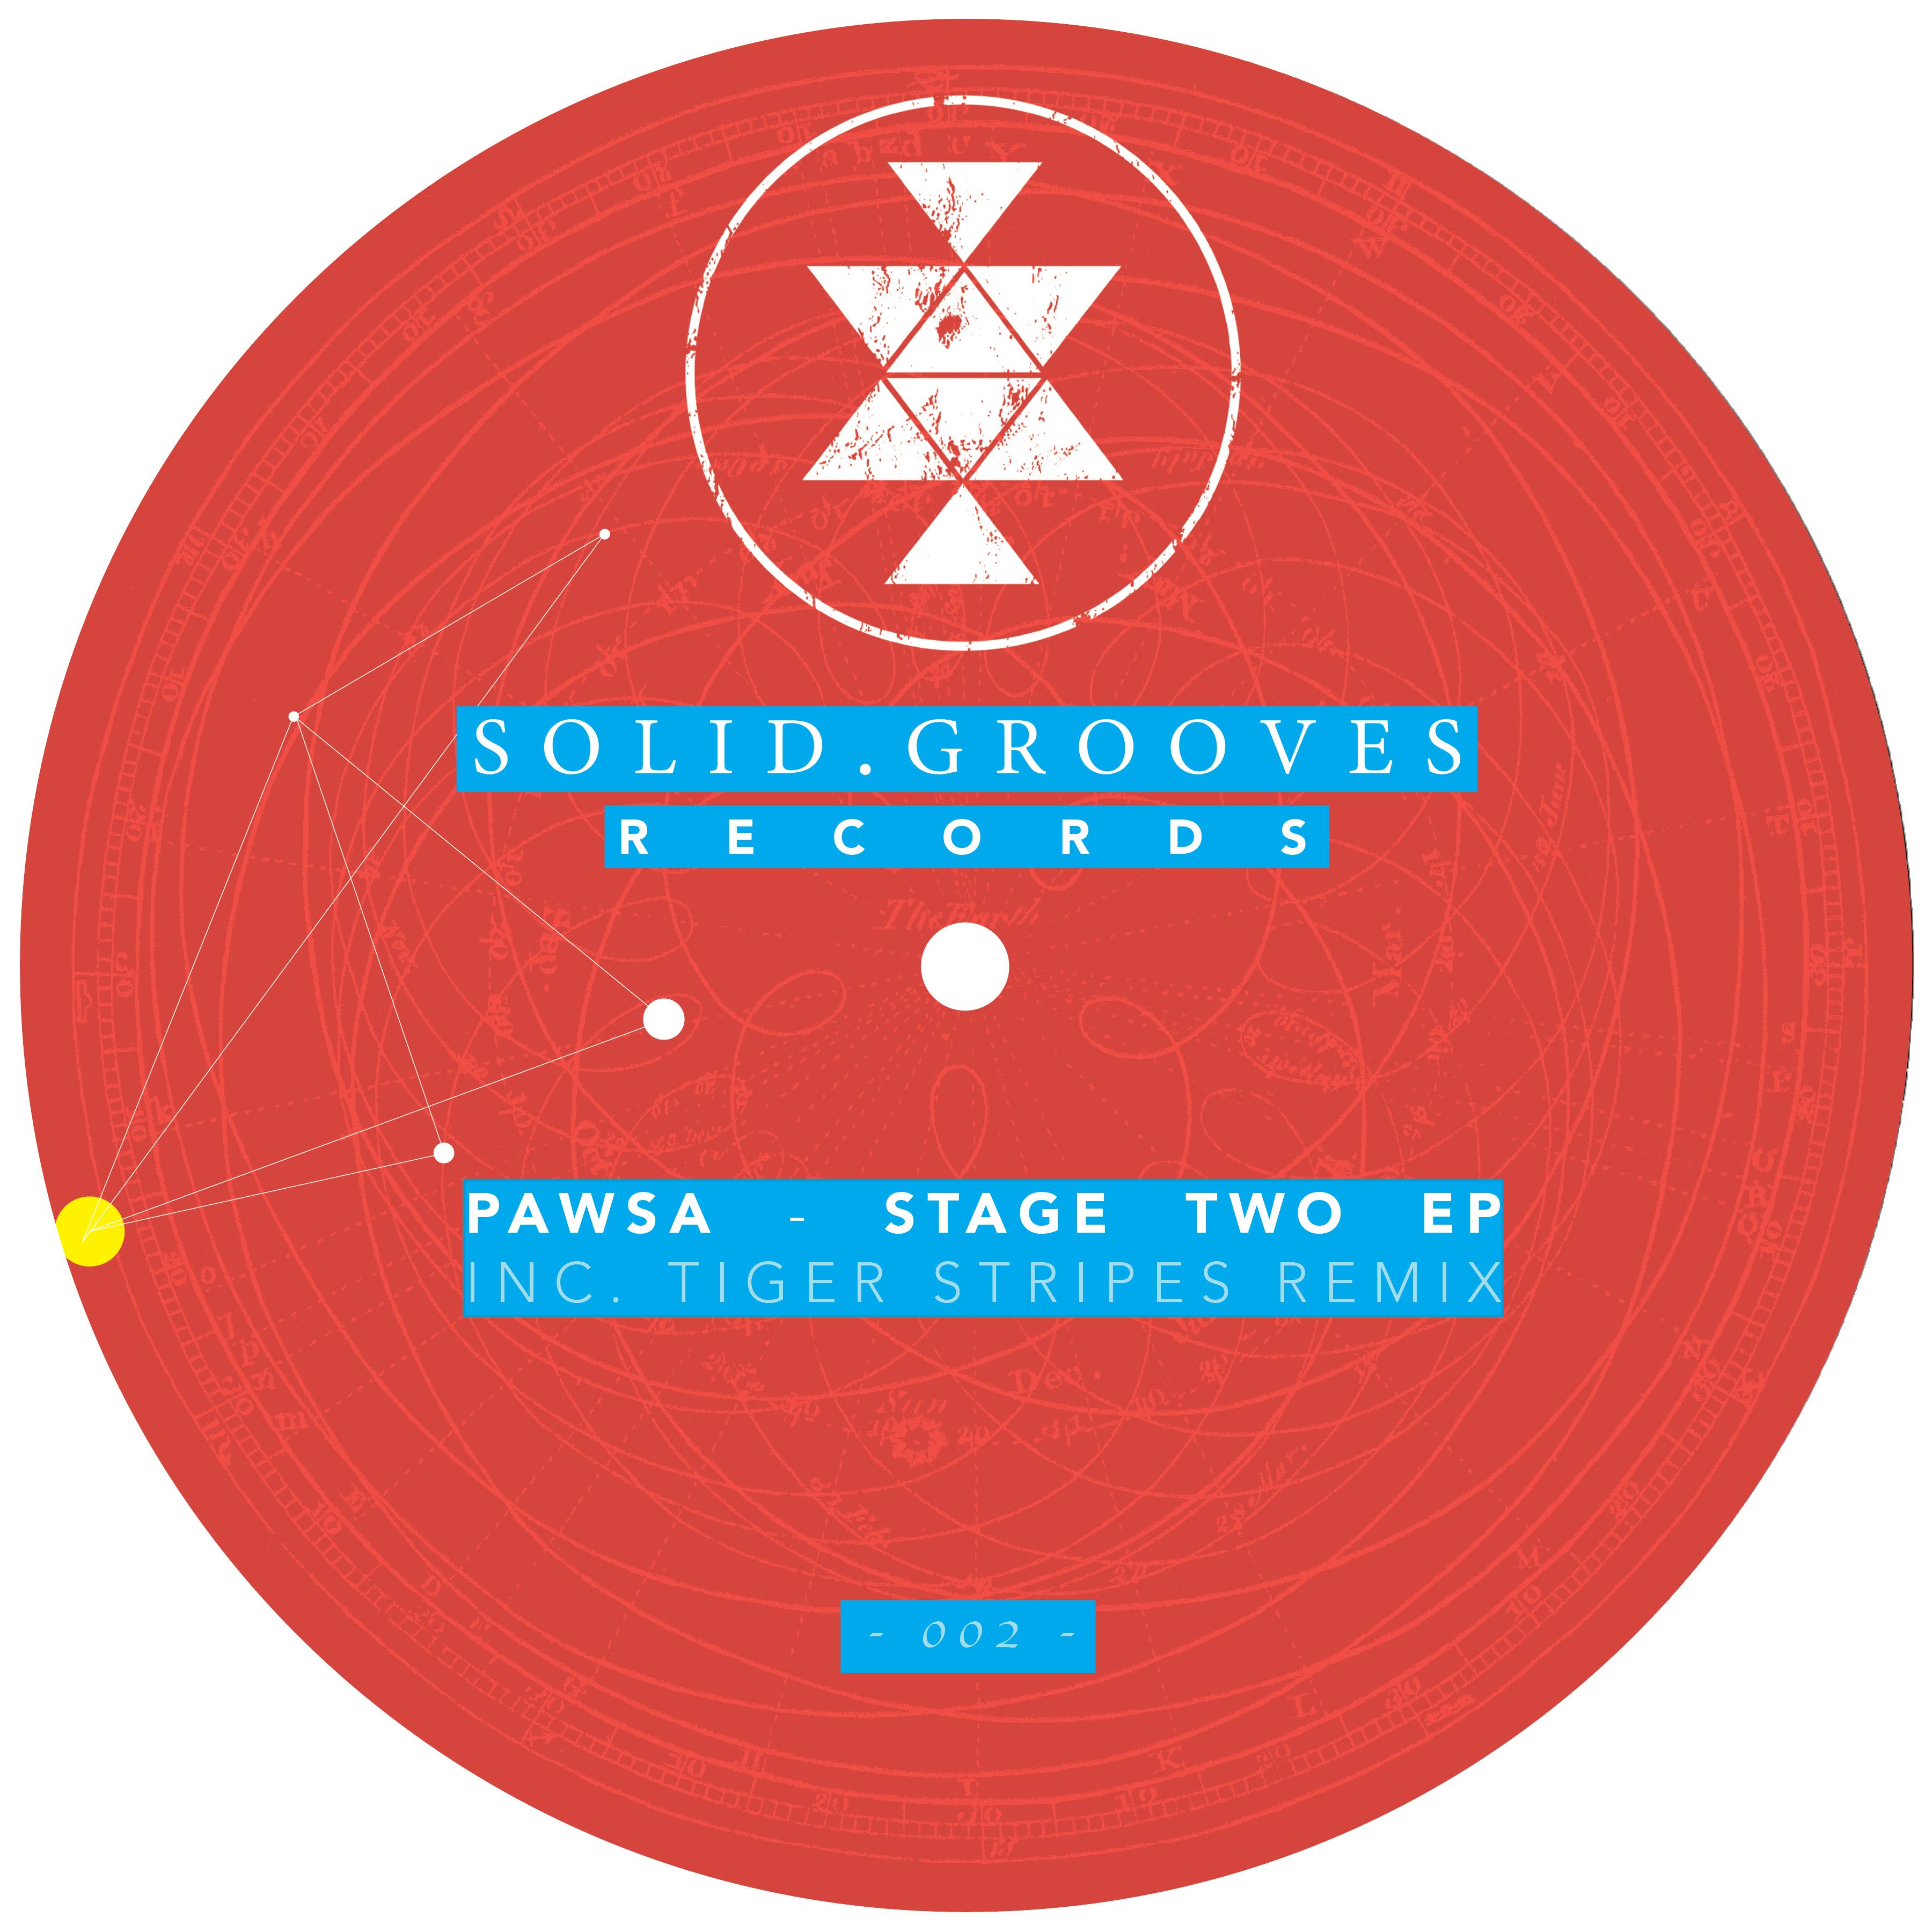 packshotpawsa-stagetwoep-solidgroovesrecords.jpg